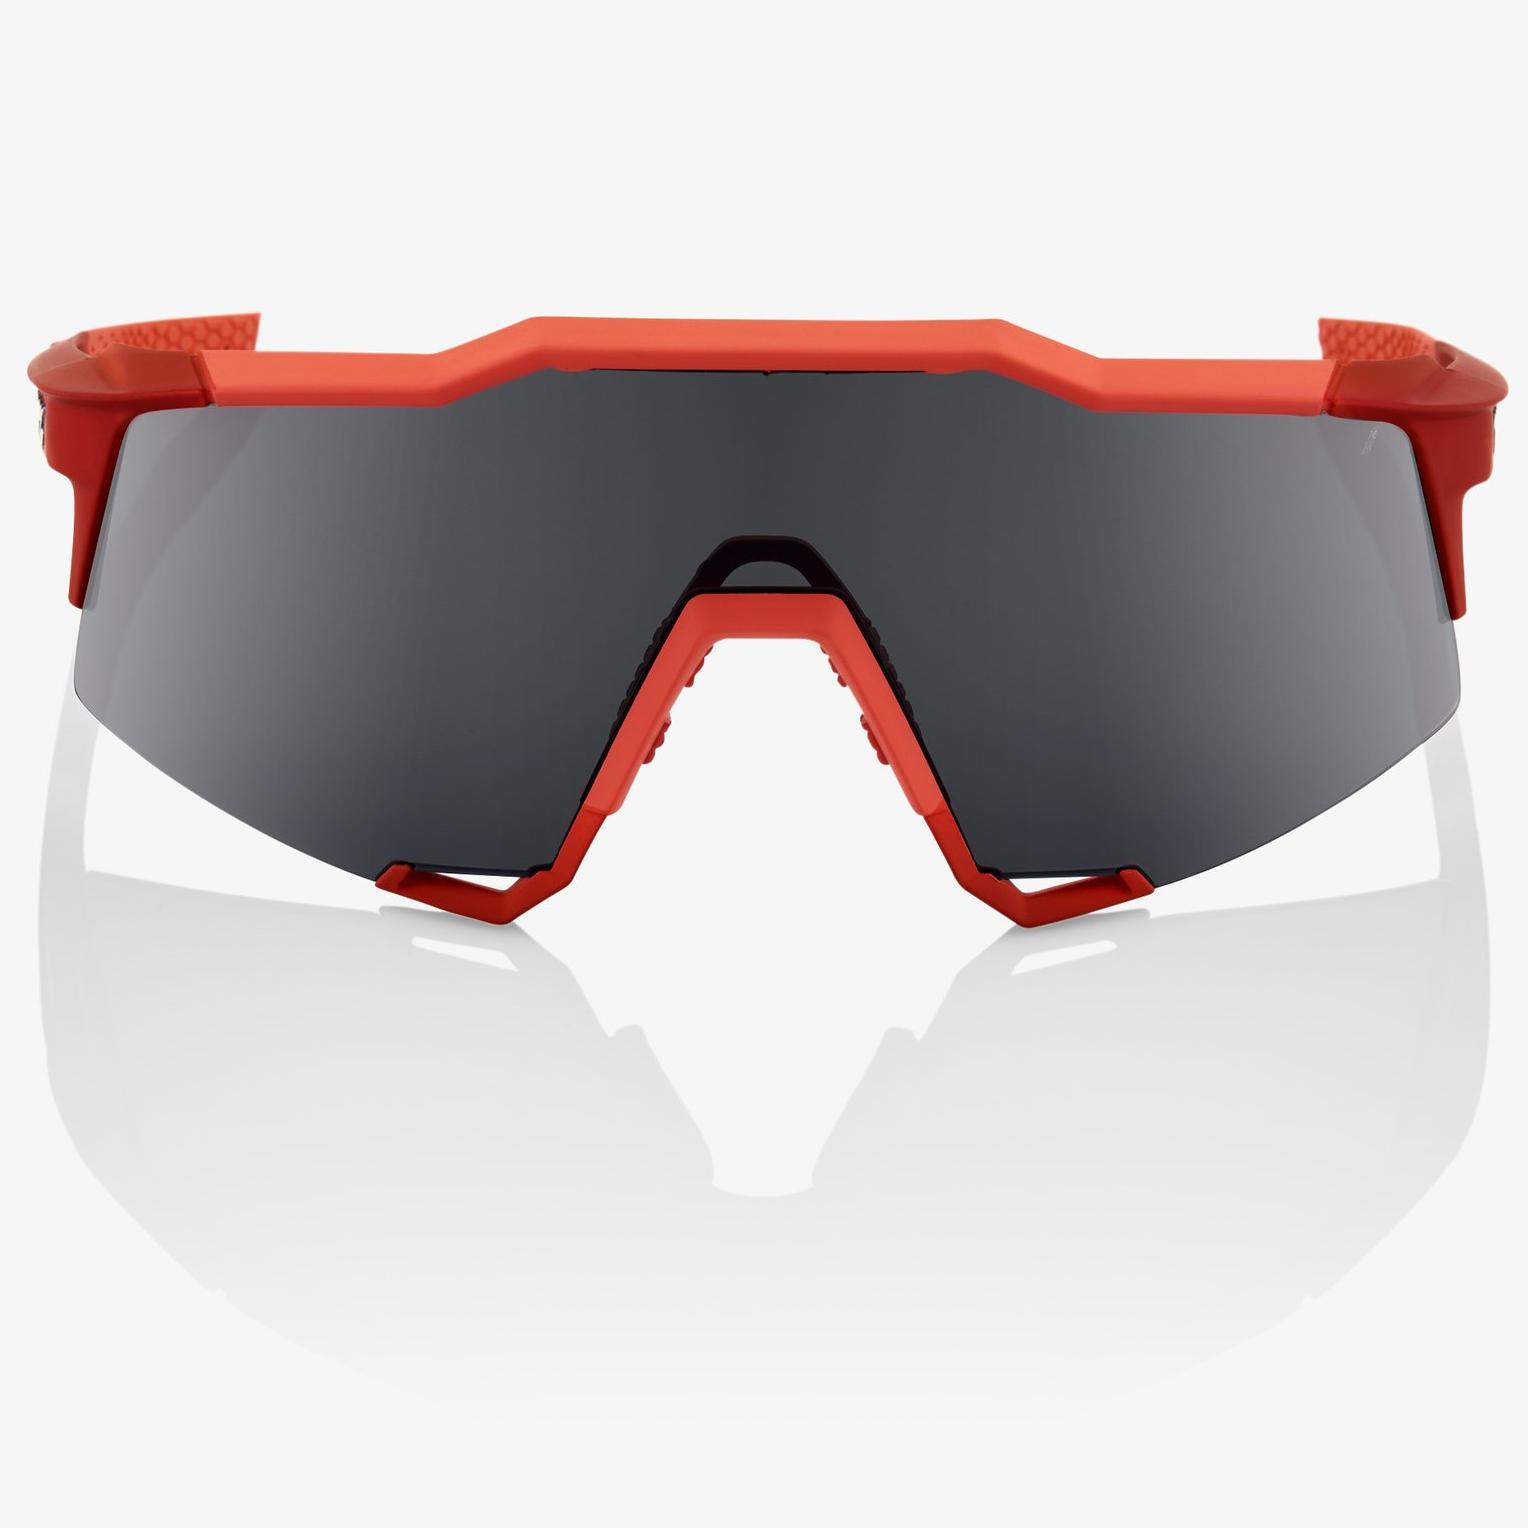 Imagen de 100% Speedcraft - Tall - Mirror Lense Gafas - Soft Tact Coral/Black Mirror + Clear